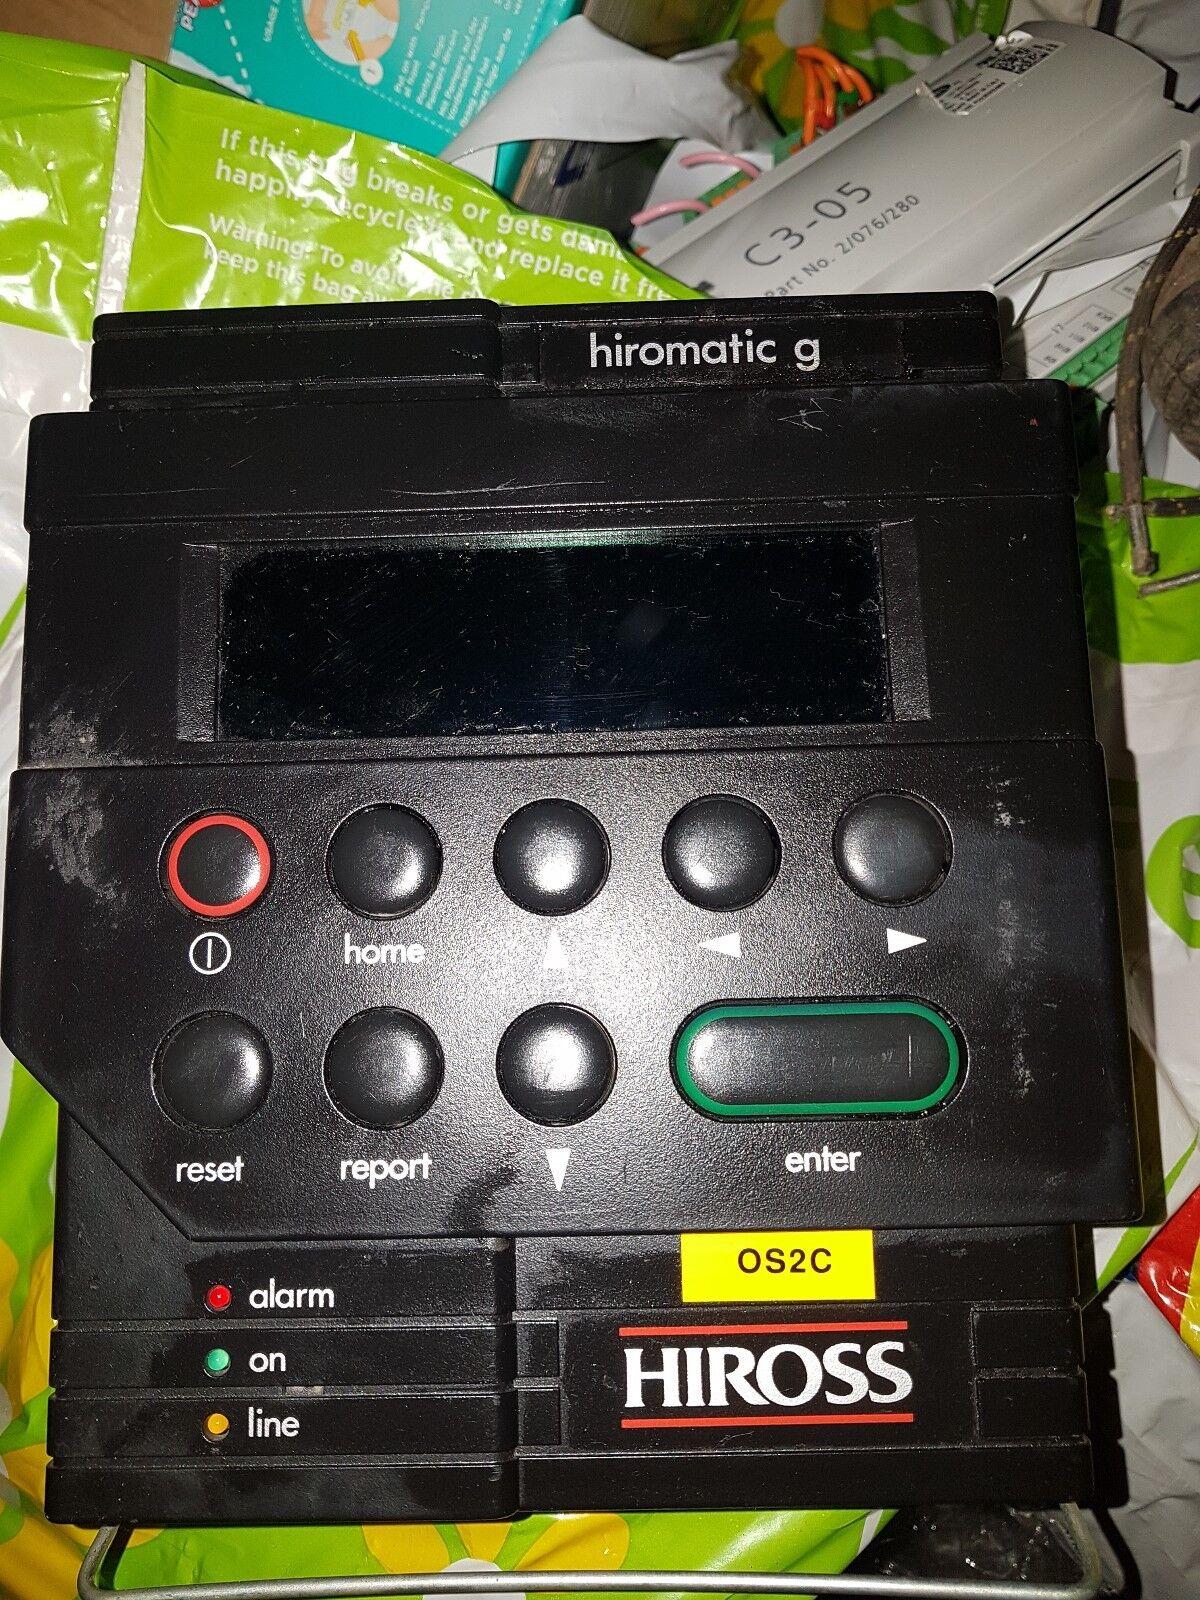 Hiross hiromatic G Code 27.50.51